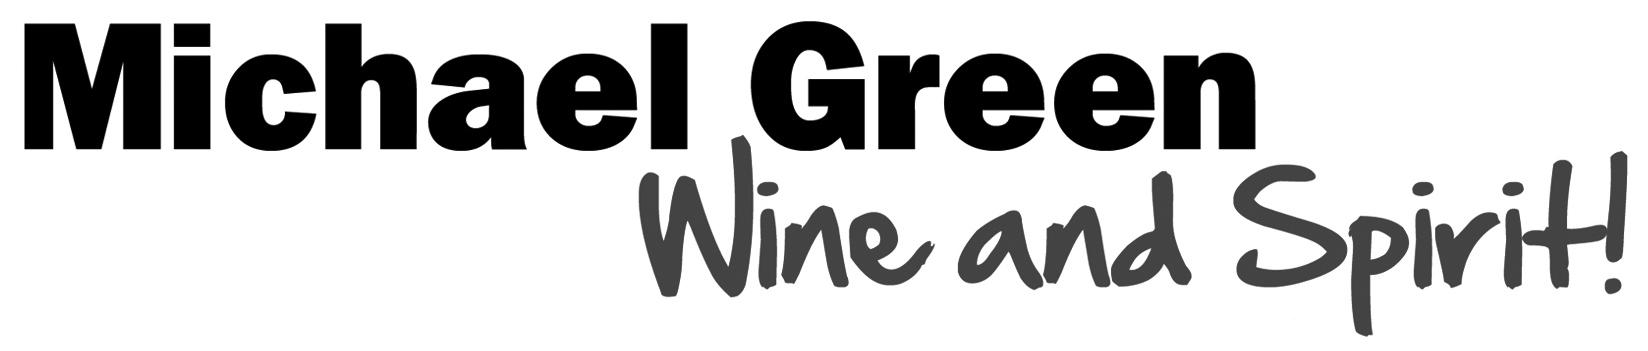 Moth Ball 2017 Sponsor Michael Green Wines Spirits